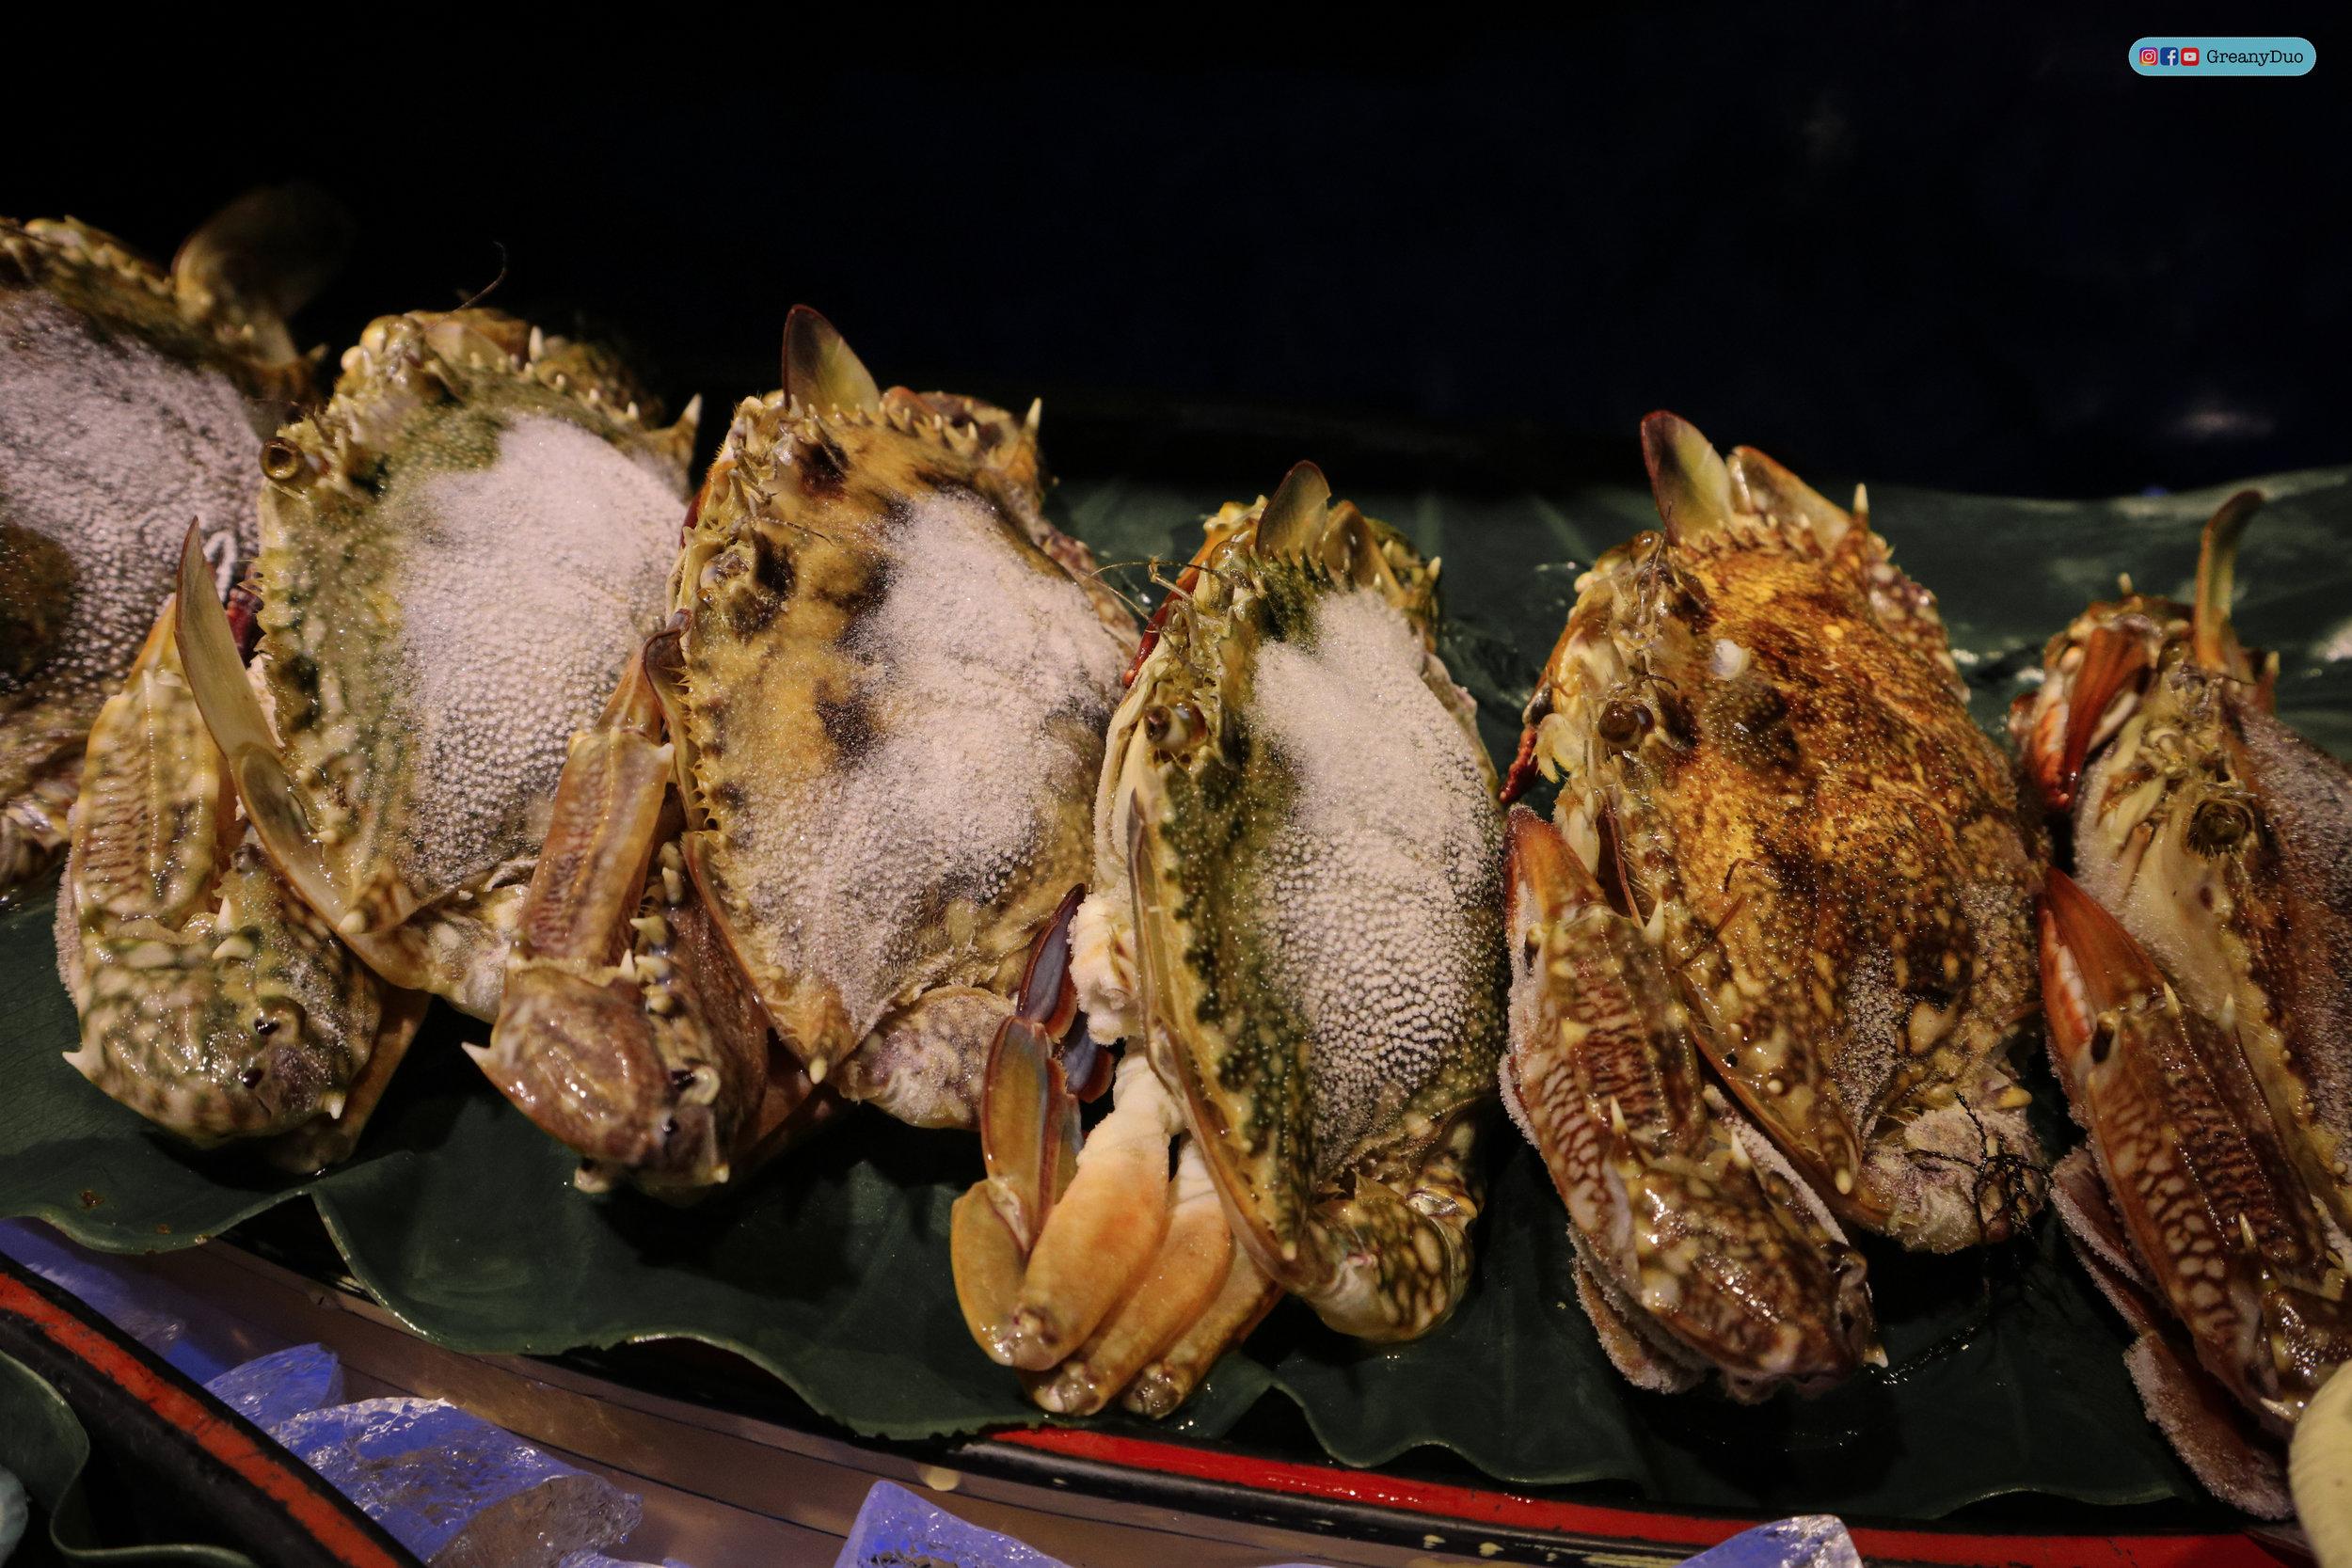 fresh crab at บุฟเฟ่ต์ชาบูไต้หวันที่ Hakkai Shabu Shabu ซีเหมินติง